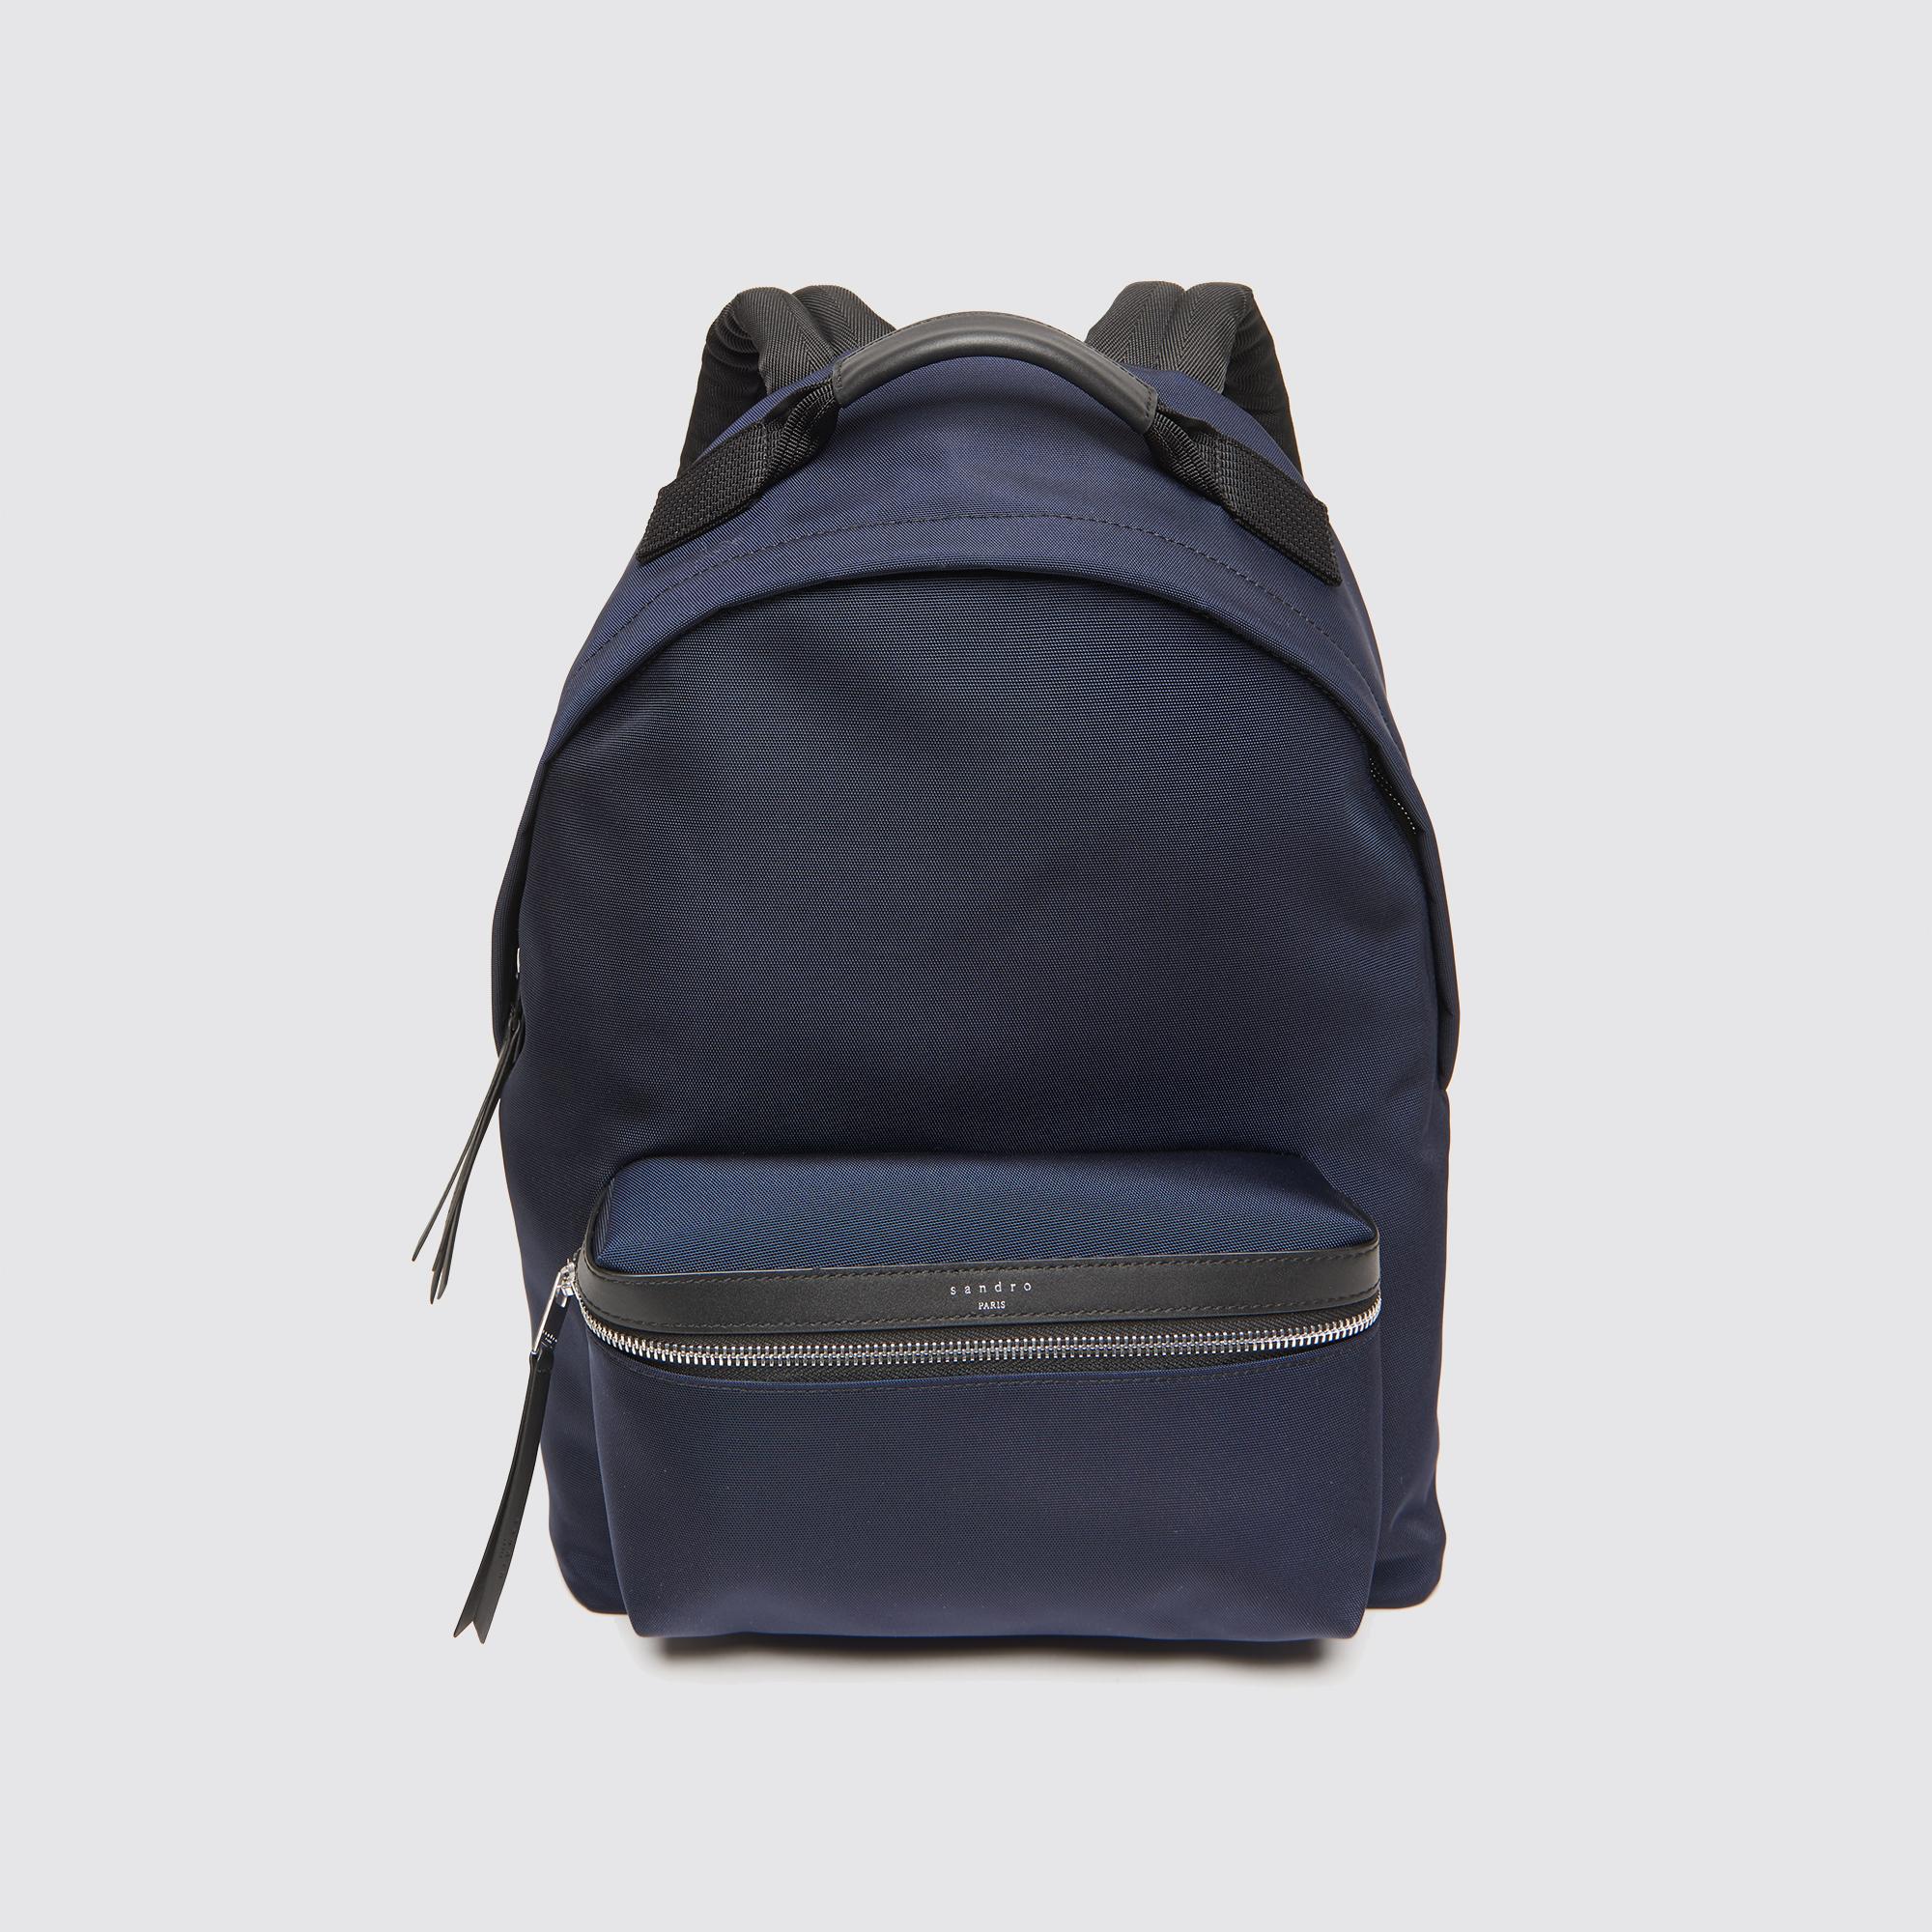 15b584564dc ... backpack sa1004s backpacks sandro paris ...